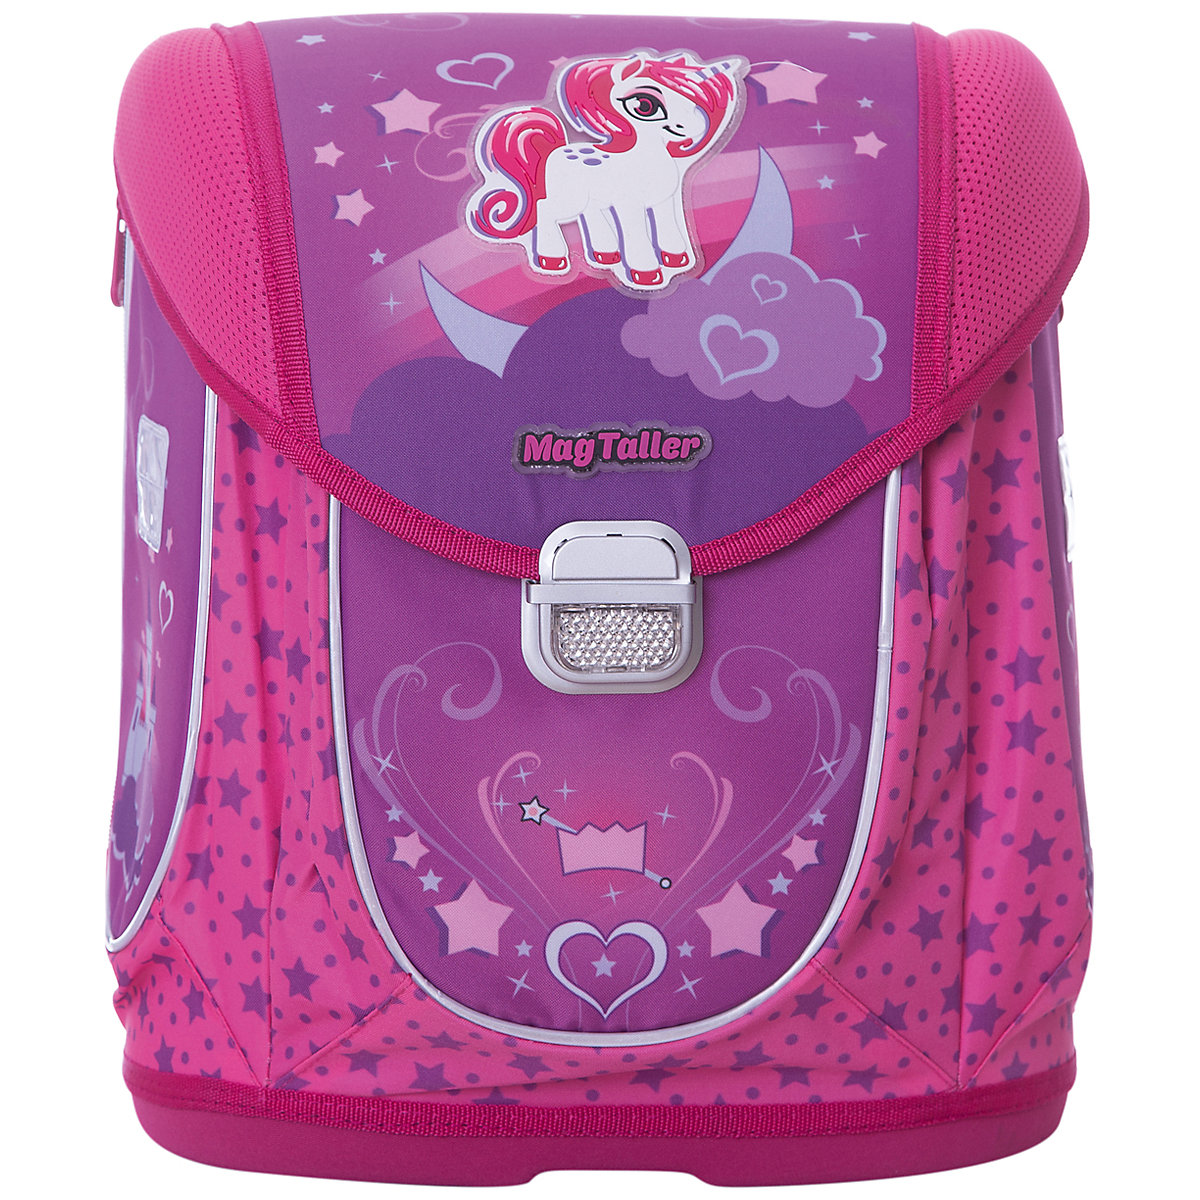 School Bags MAGTALLER 8316018 schoolbag backpack orthopedic bag for boy and girl animals flowers hot cartoon children s 3d plush backpack cool super mario bros plush school bag cosplay turtle bag toy for kindergarten boy girl